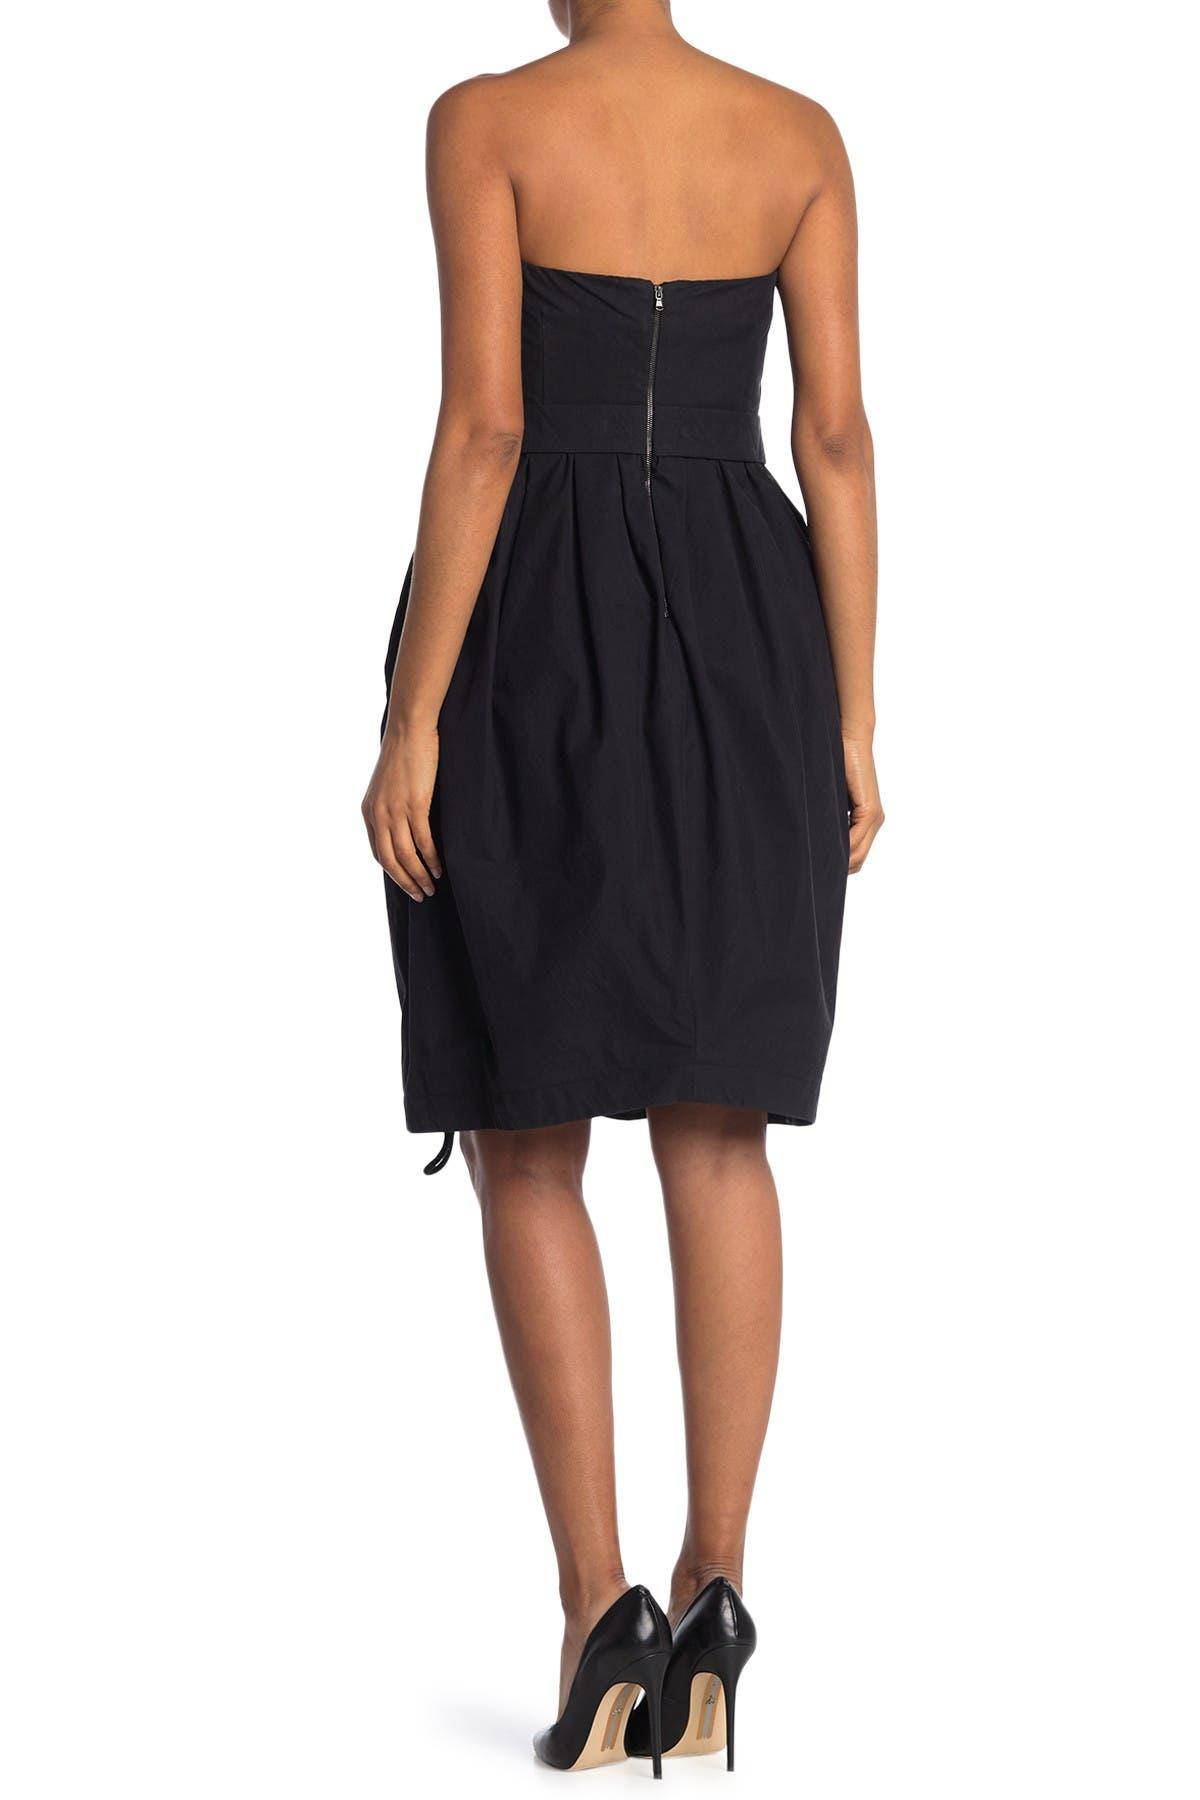 Image of MOSCHINO Open Zipper Dress